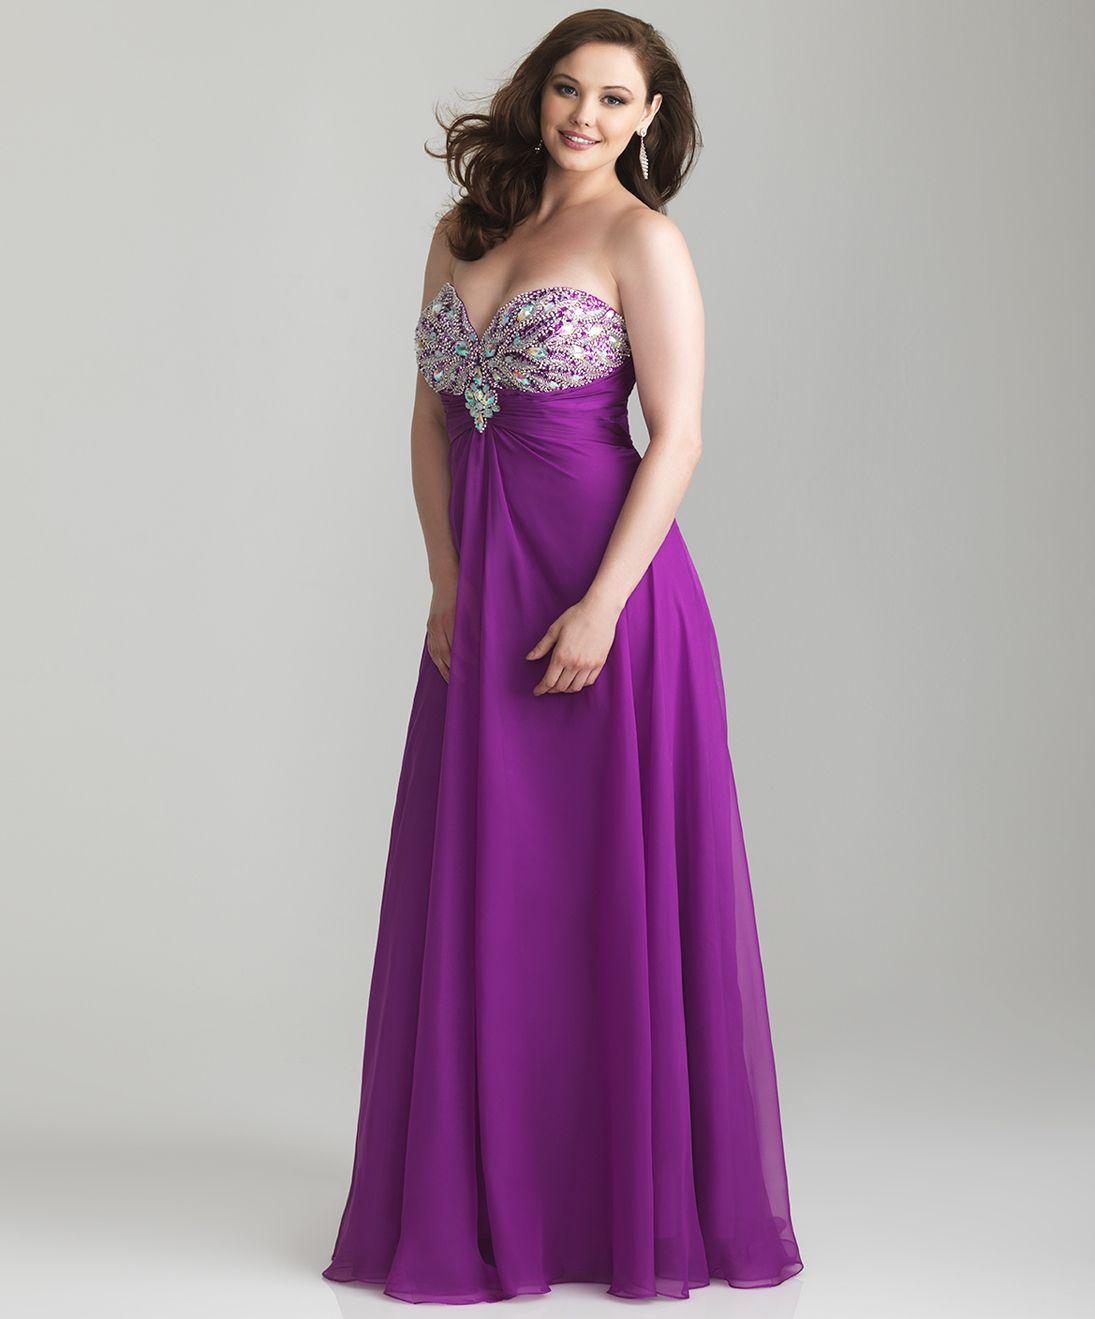 Wedding dresses plus size for best appearance wedding dress